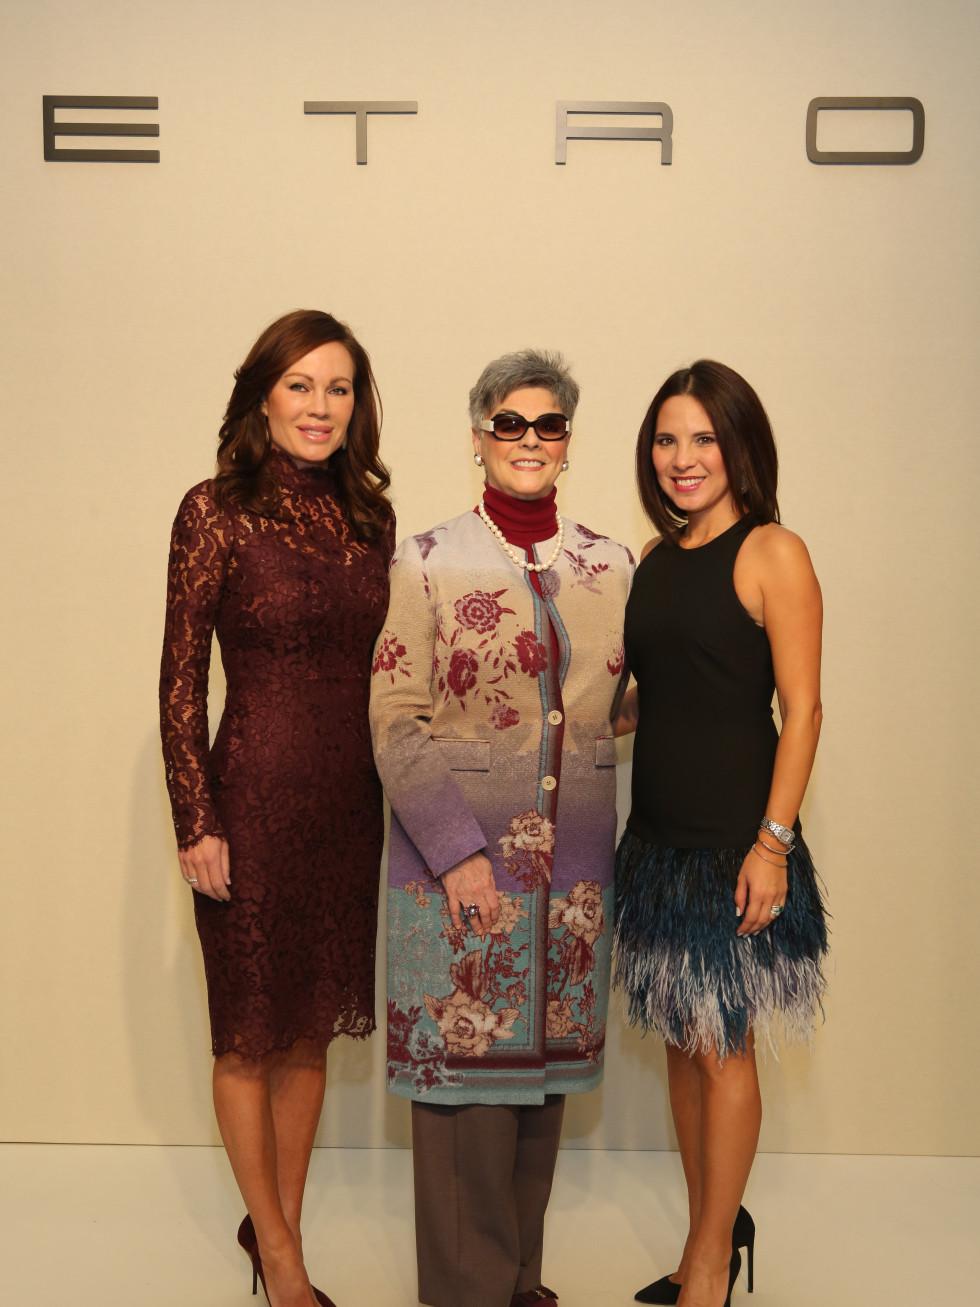 News, Shelby, Child Advocates Angels of Hope luncheon, Dec. 2015, Brandi Maxwell, Linda Messner, Marlene Casares